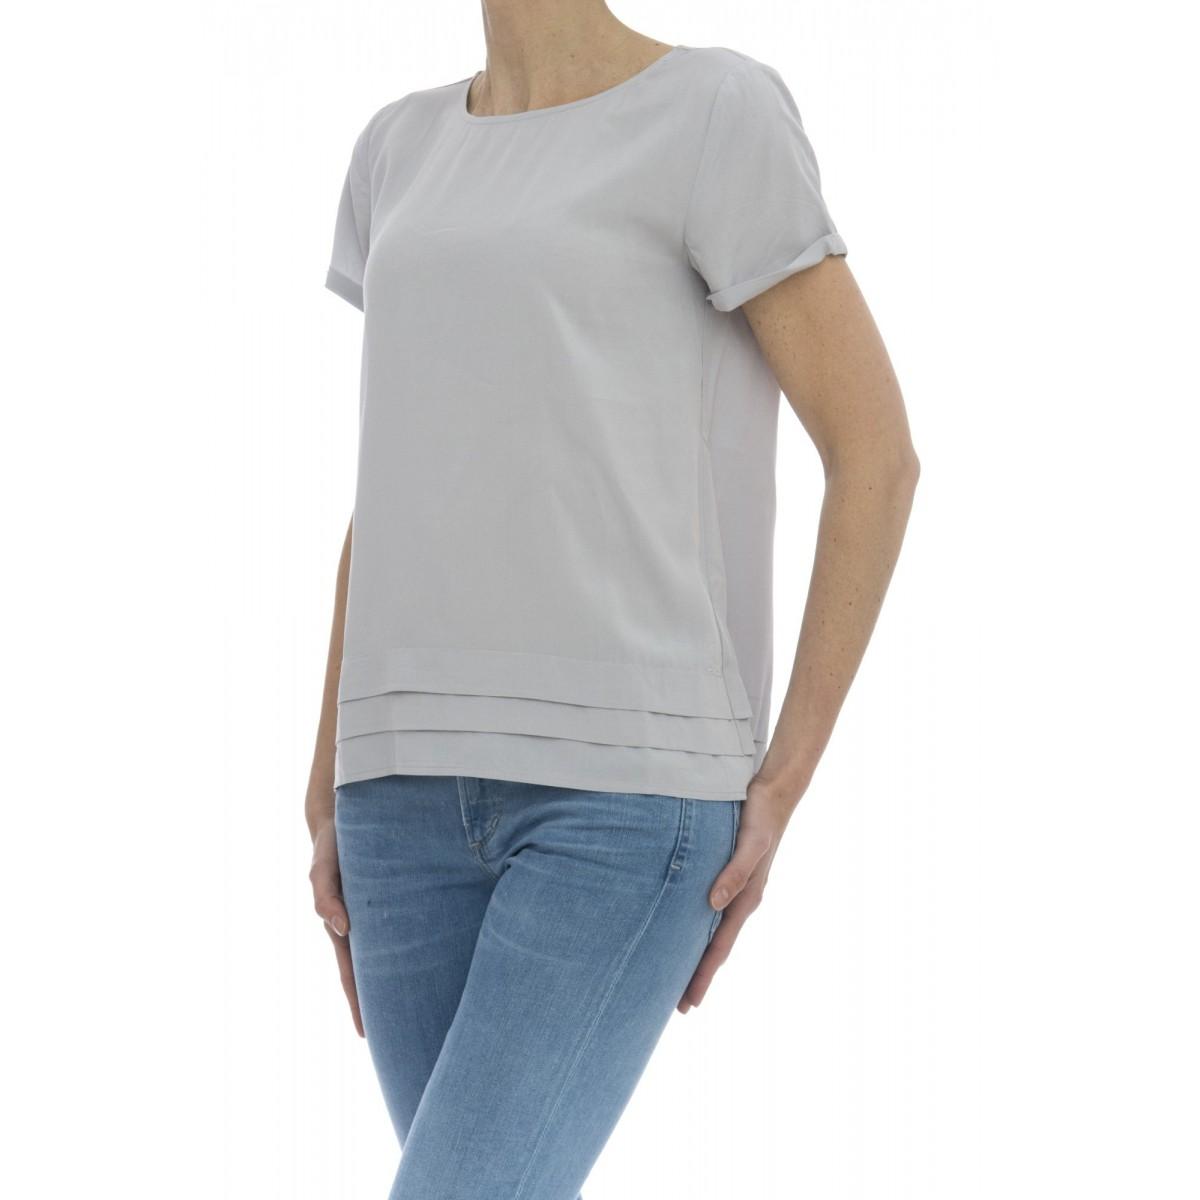 T-shirt donna - Sw036 t-shirt viscosa